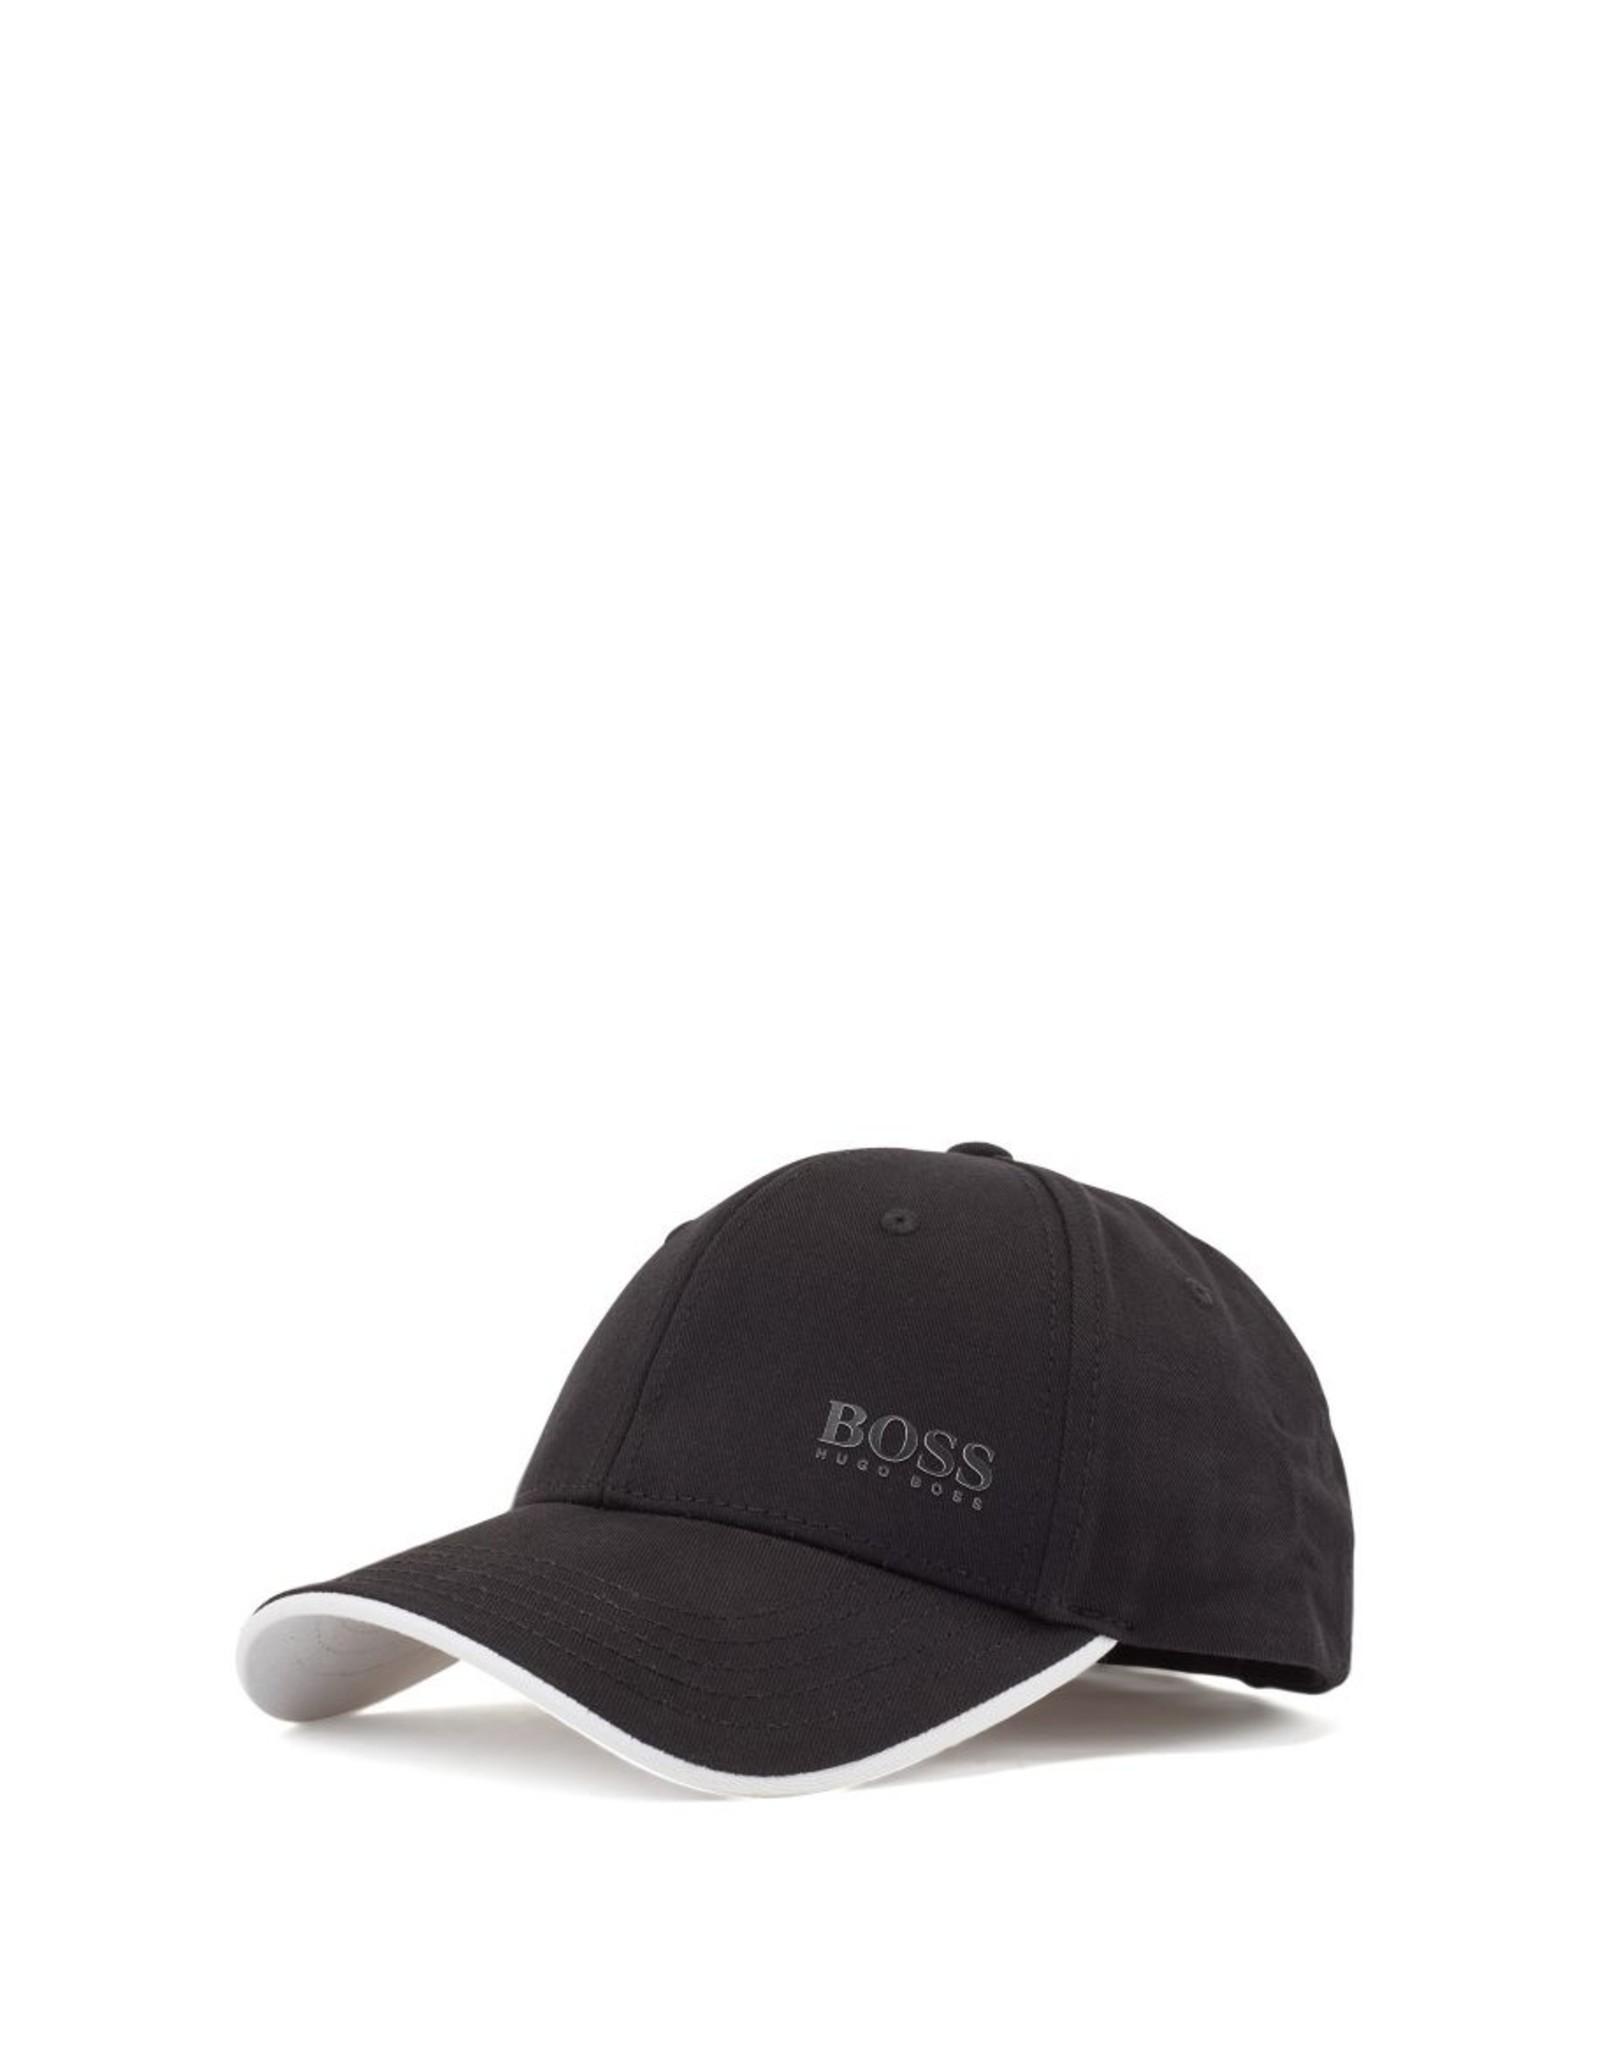 BOSS ATHLEISURE BOSS ATHLEISURE CAP-X SS21